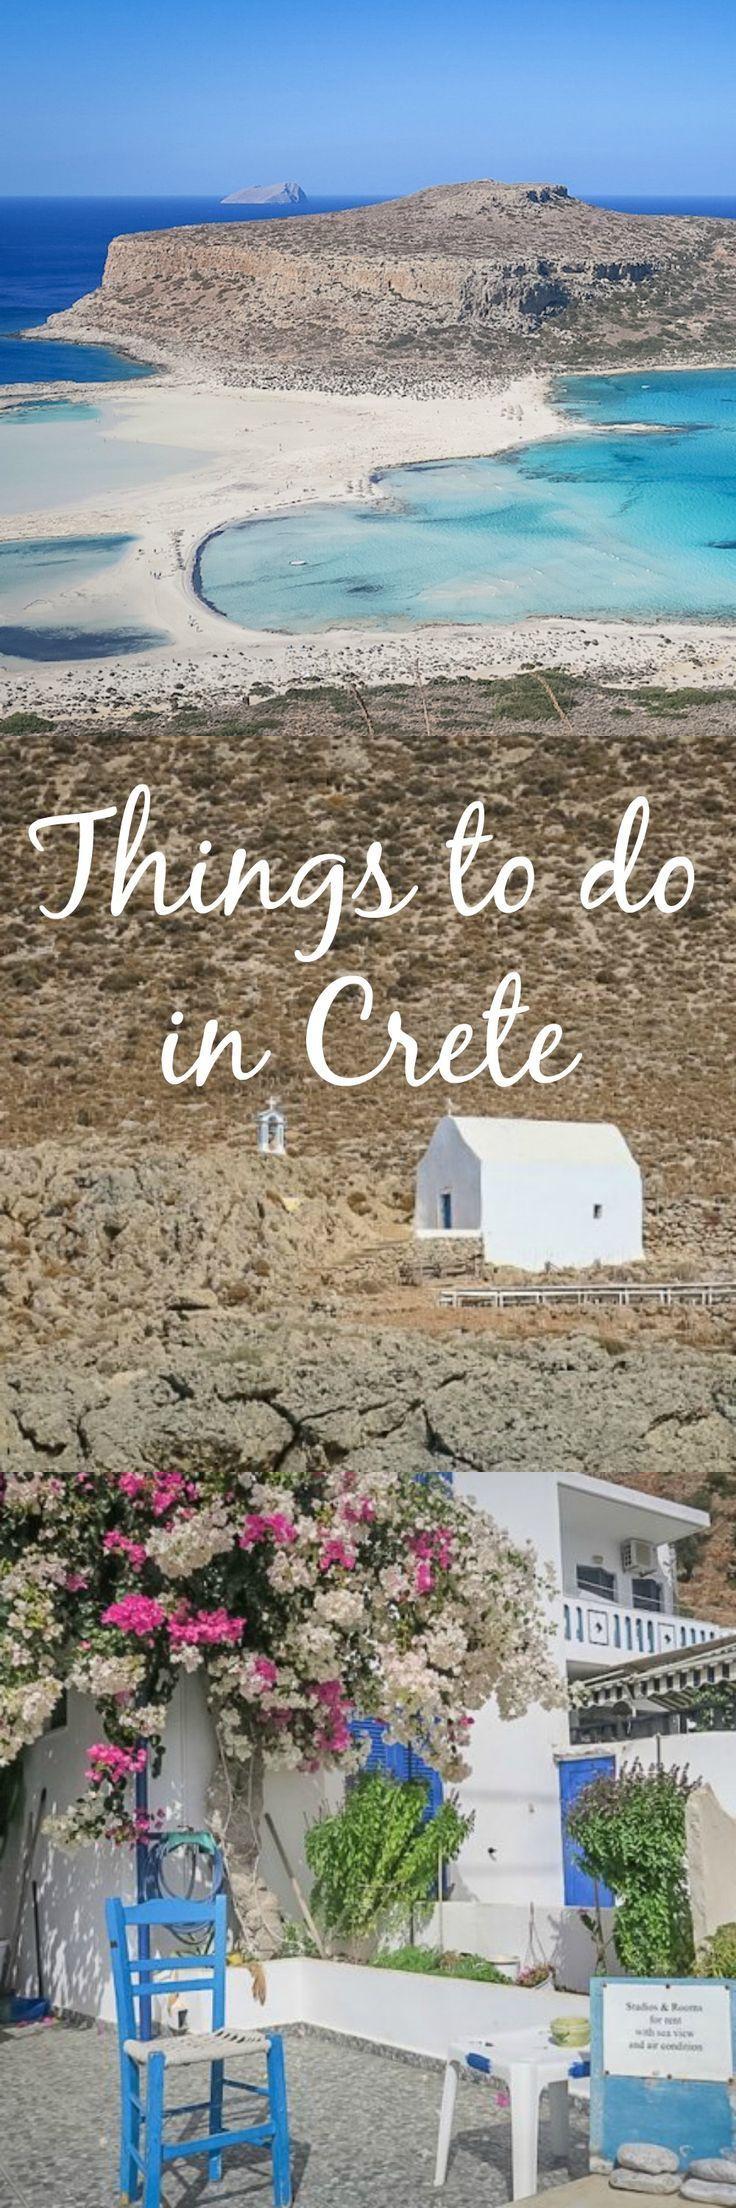 Chania Kreta 15 Tipps Zu Stranden Ausflugen Den Besten Restaurants Kreta Griekenland Kreta Griekenland